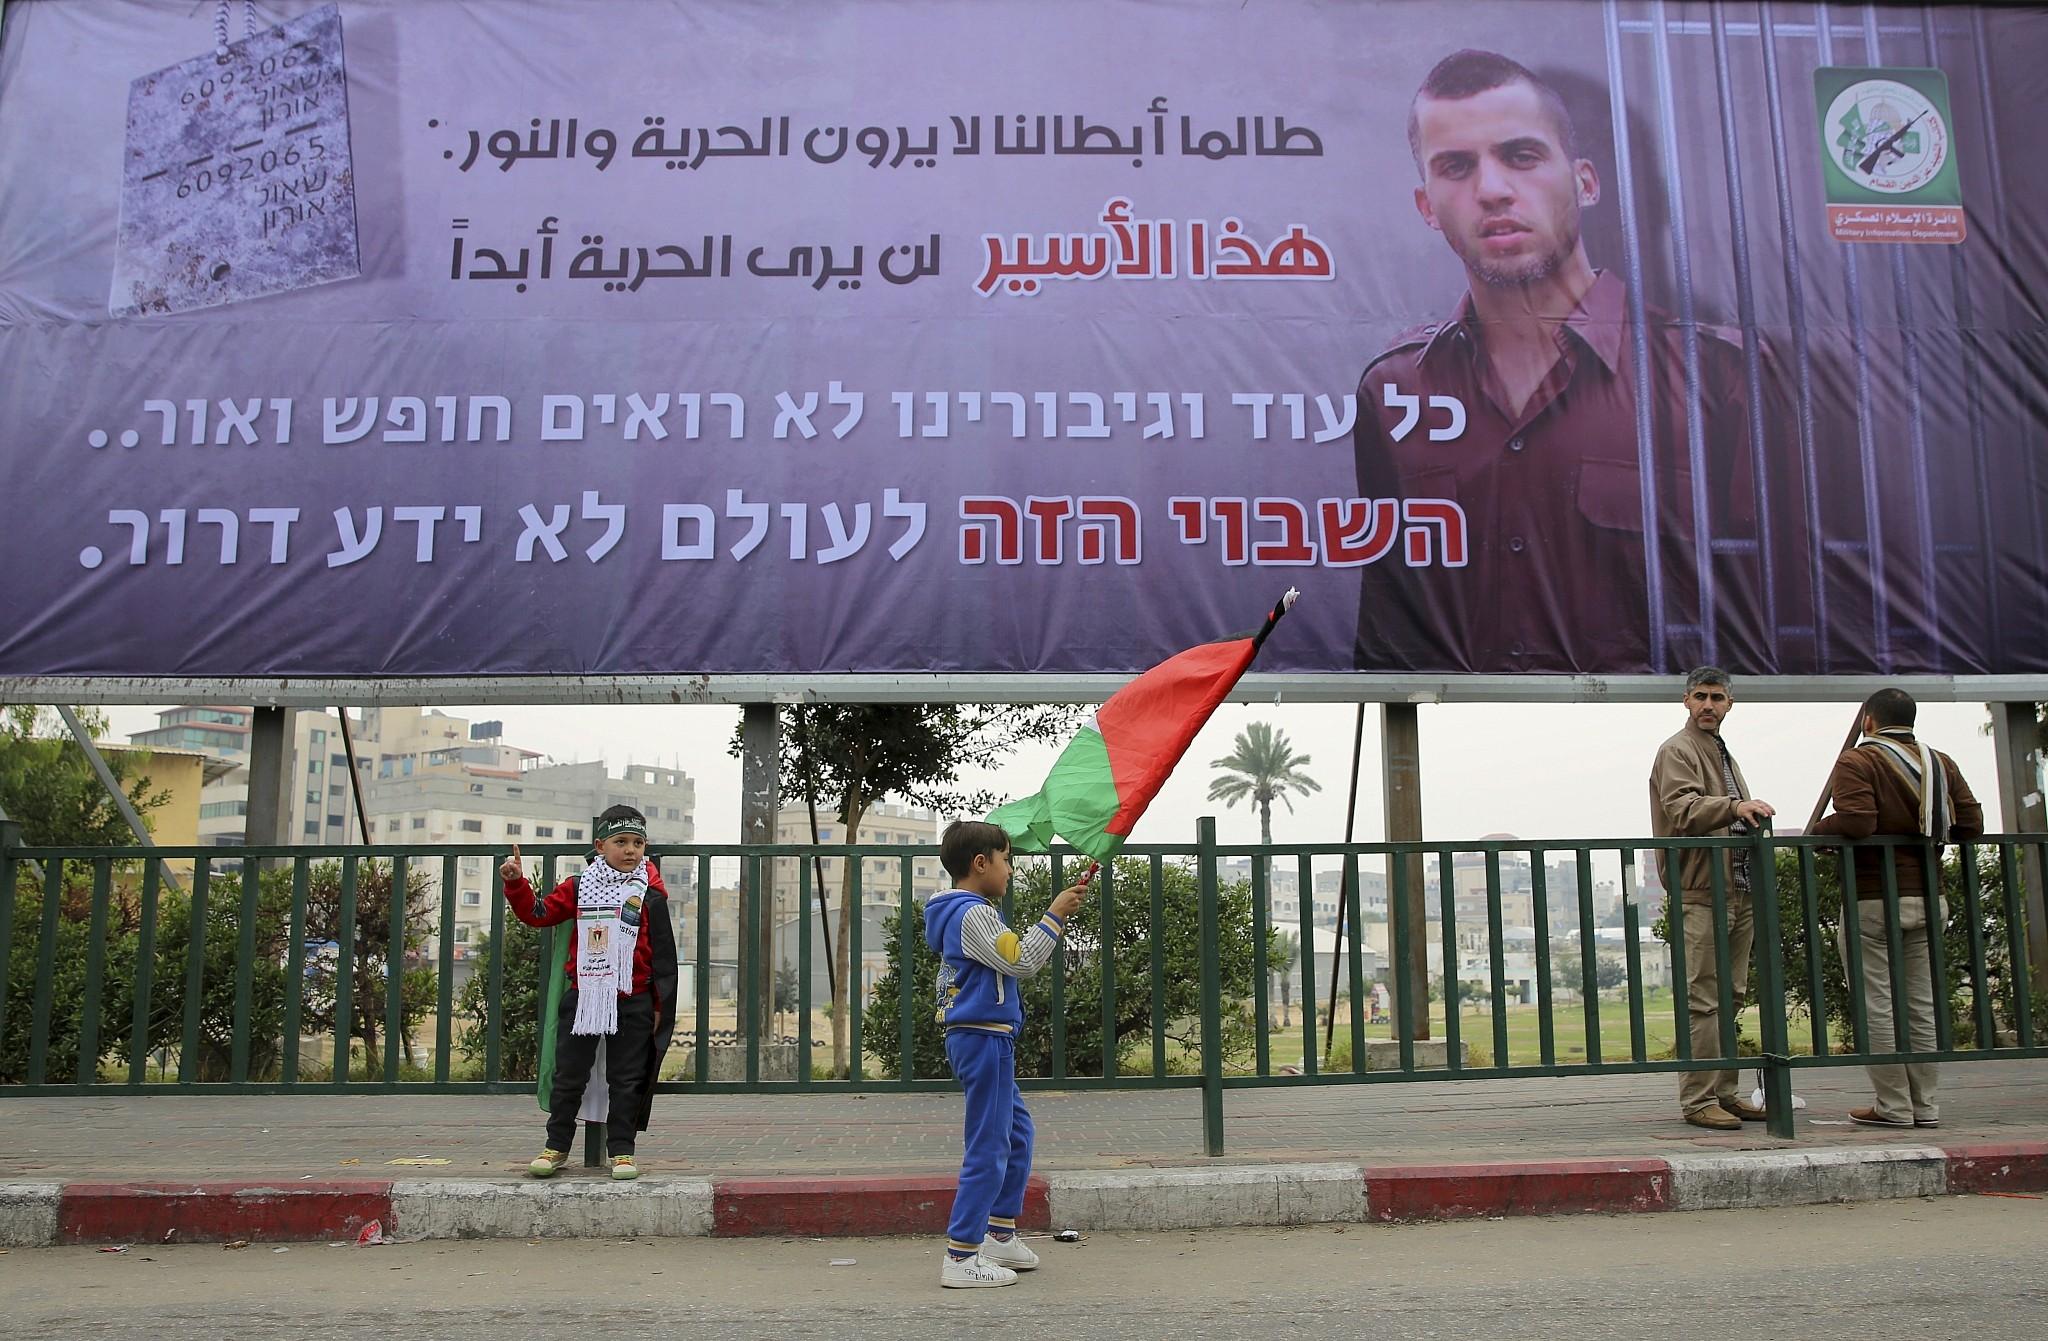 Rockets Fired from Gaza Interrupt Memorial Ceremony